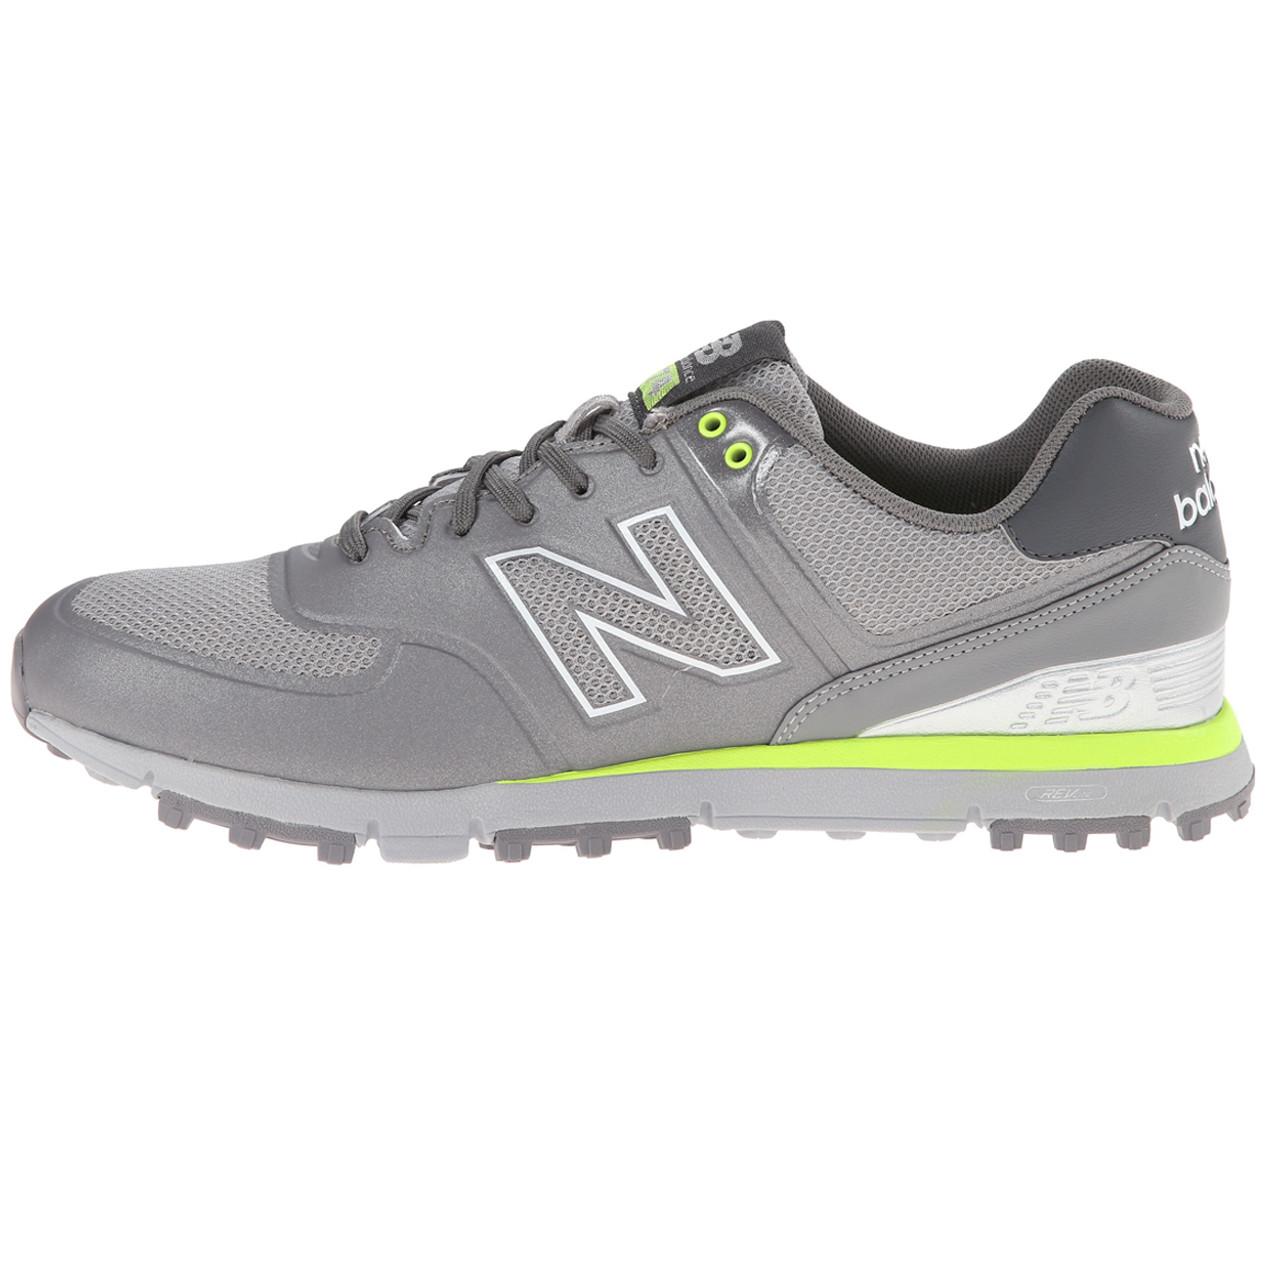 beste website Exklusive Angebote diversifiziert in der Verpackung New Balance NBG574B Spikeless Golf Shoes